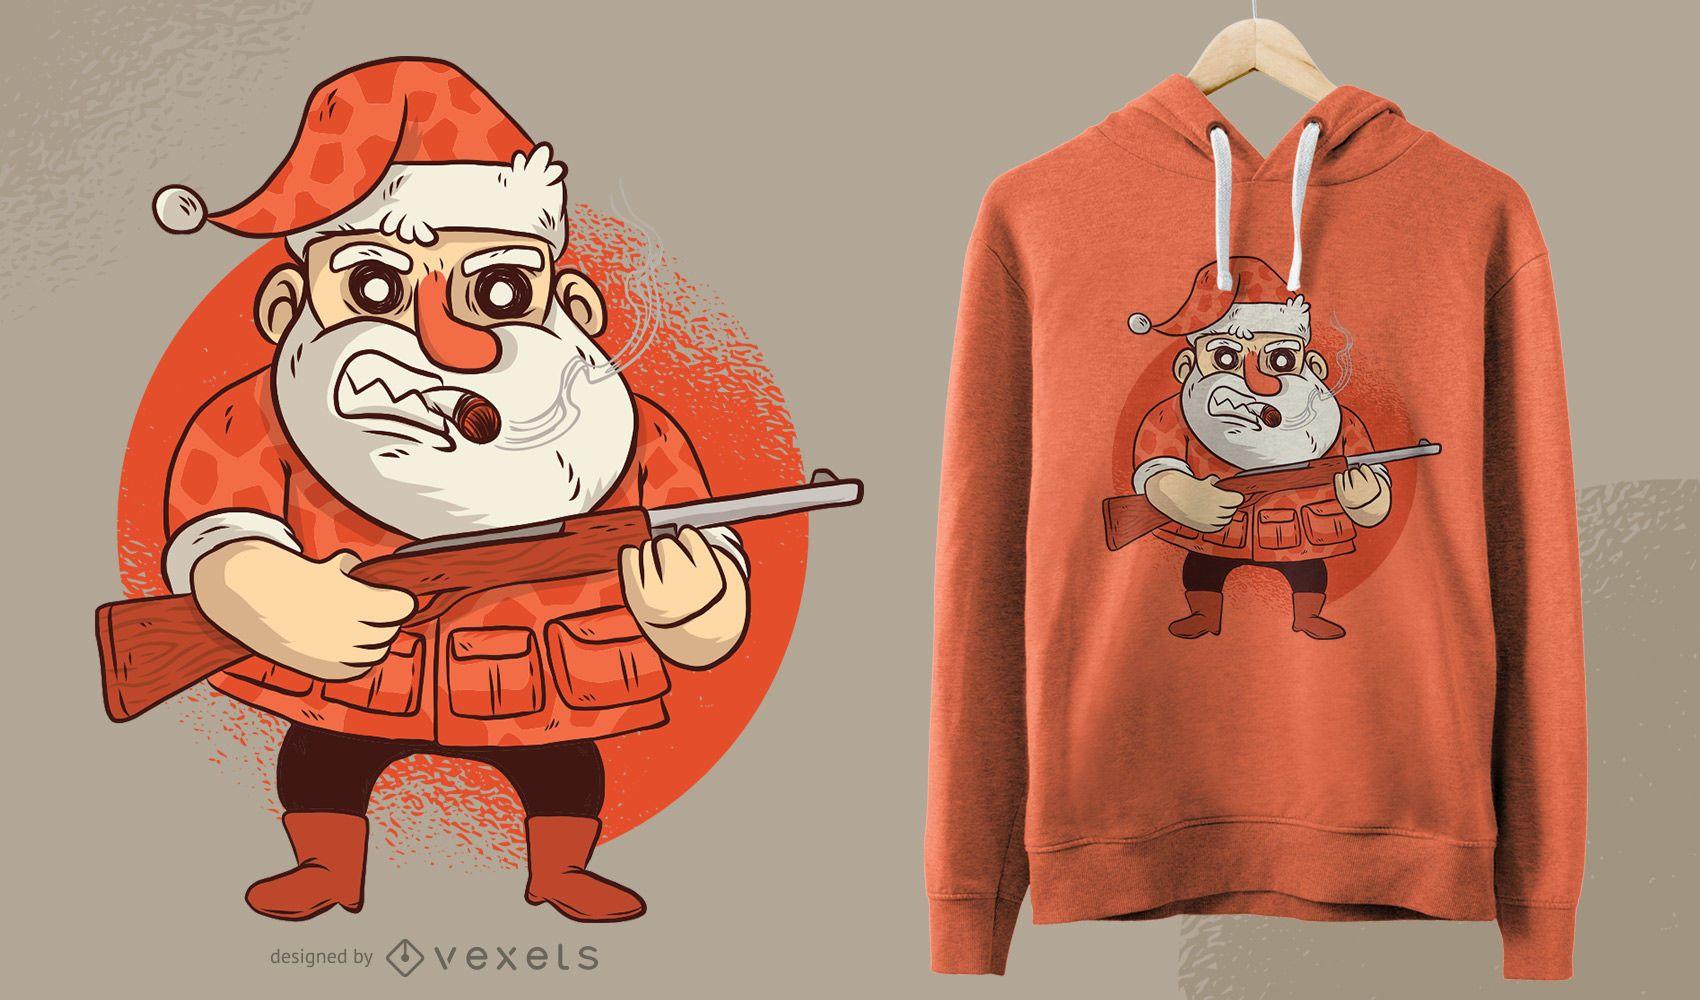 Hunting Santa Funny Christmas Cartoon T-shirt Design